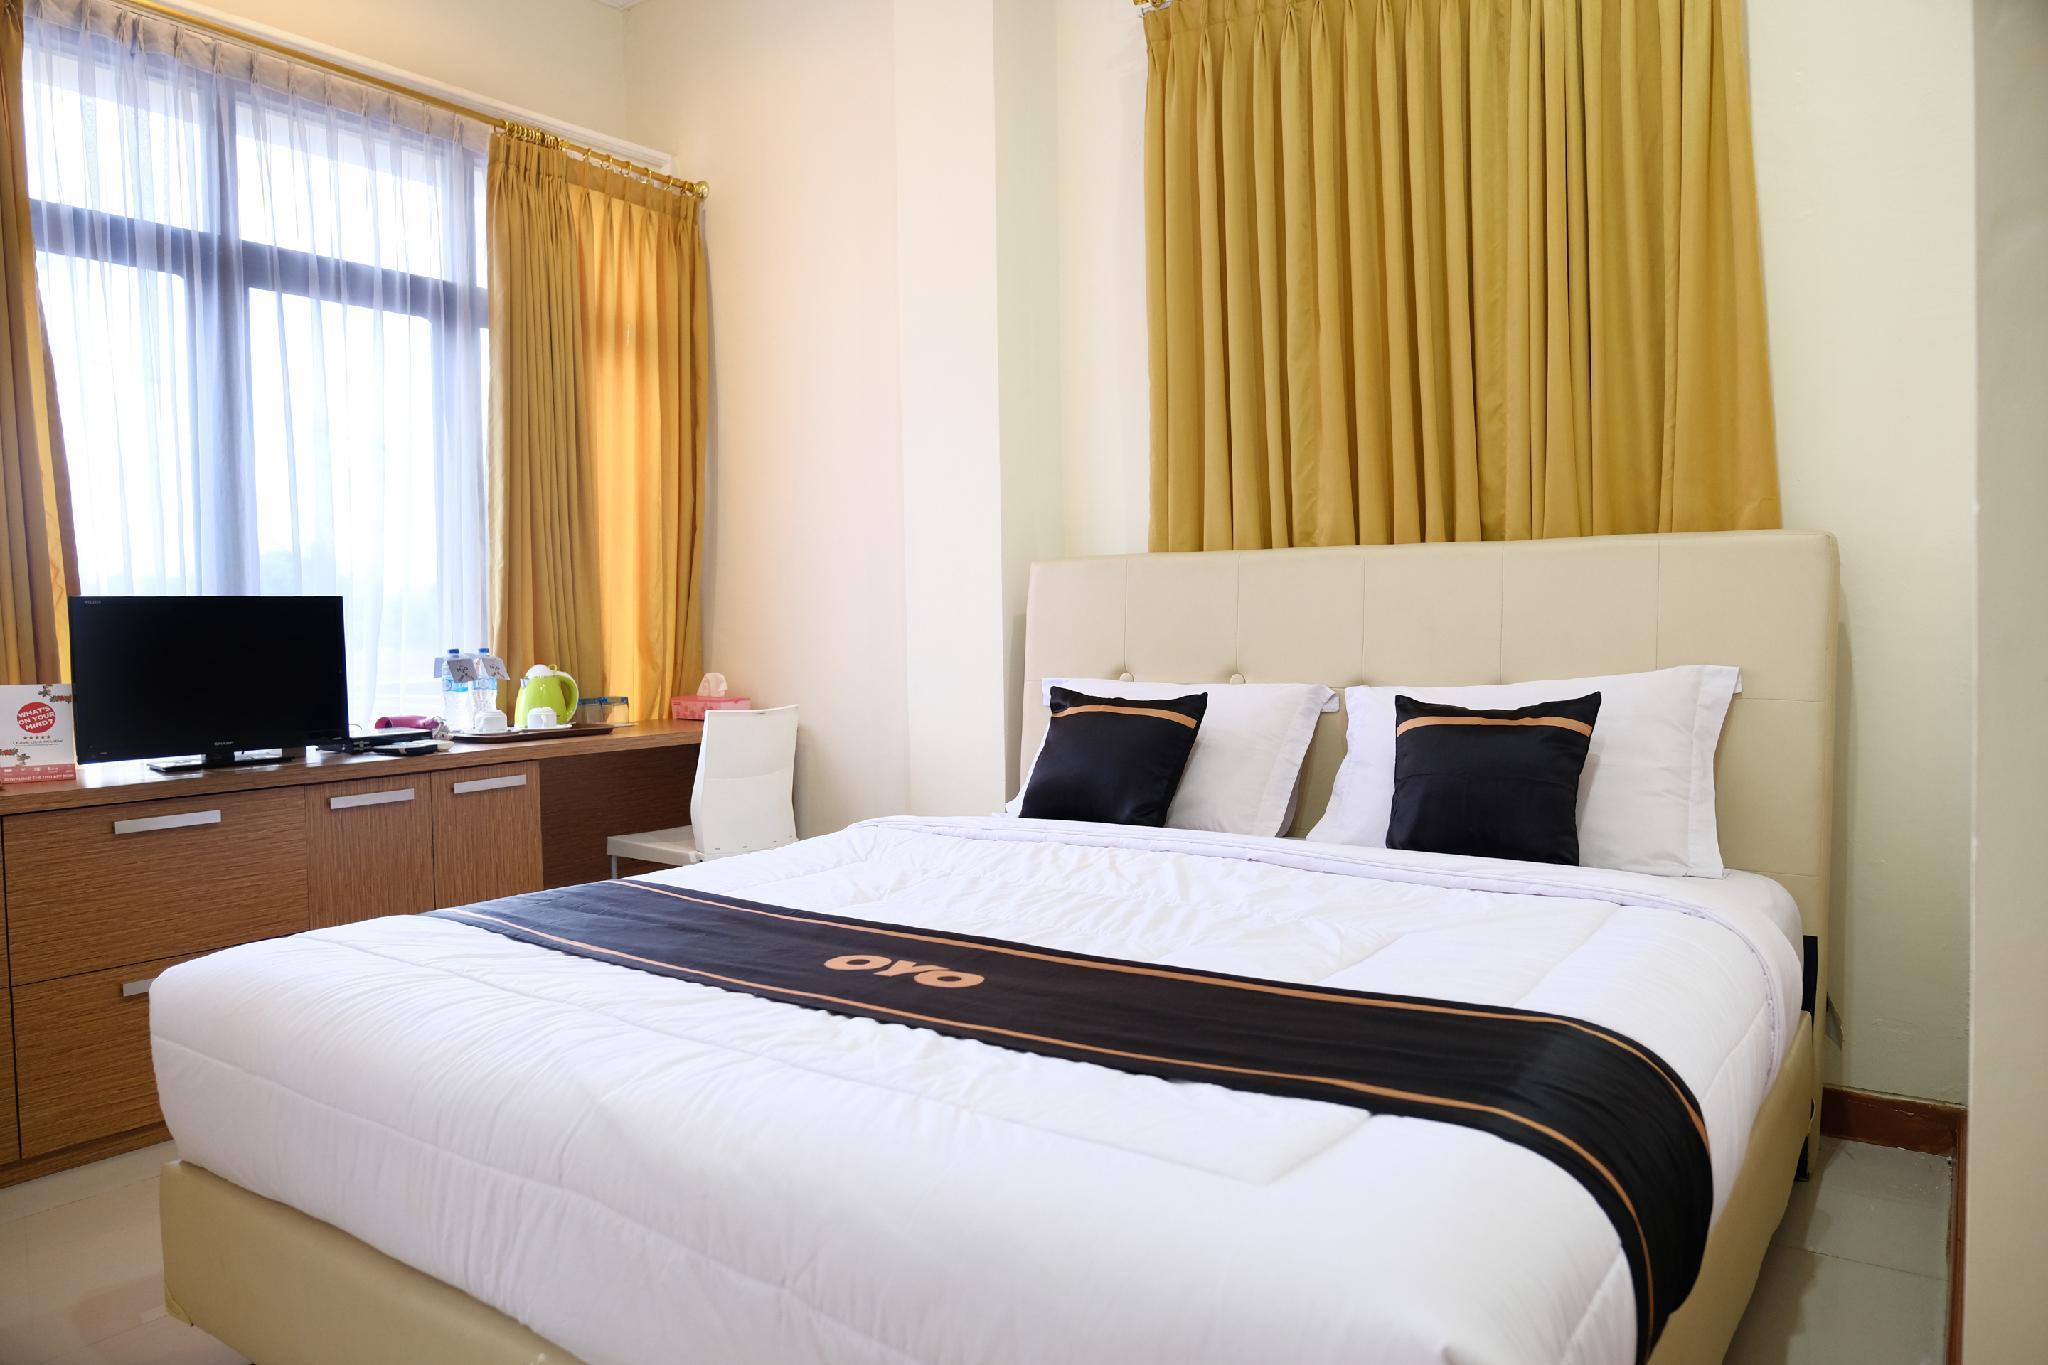 OYO 1612 Hotel Central City